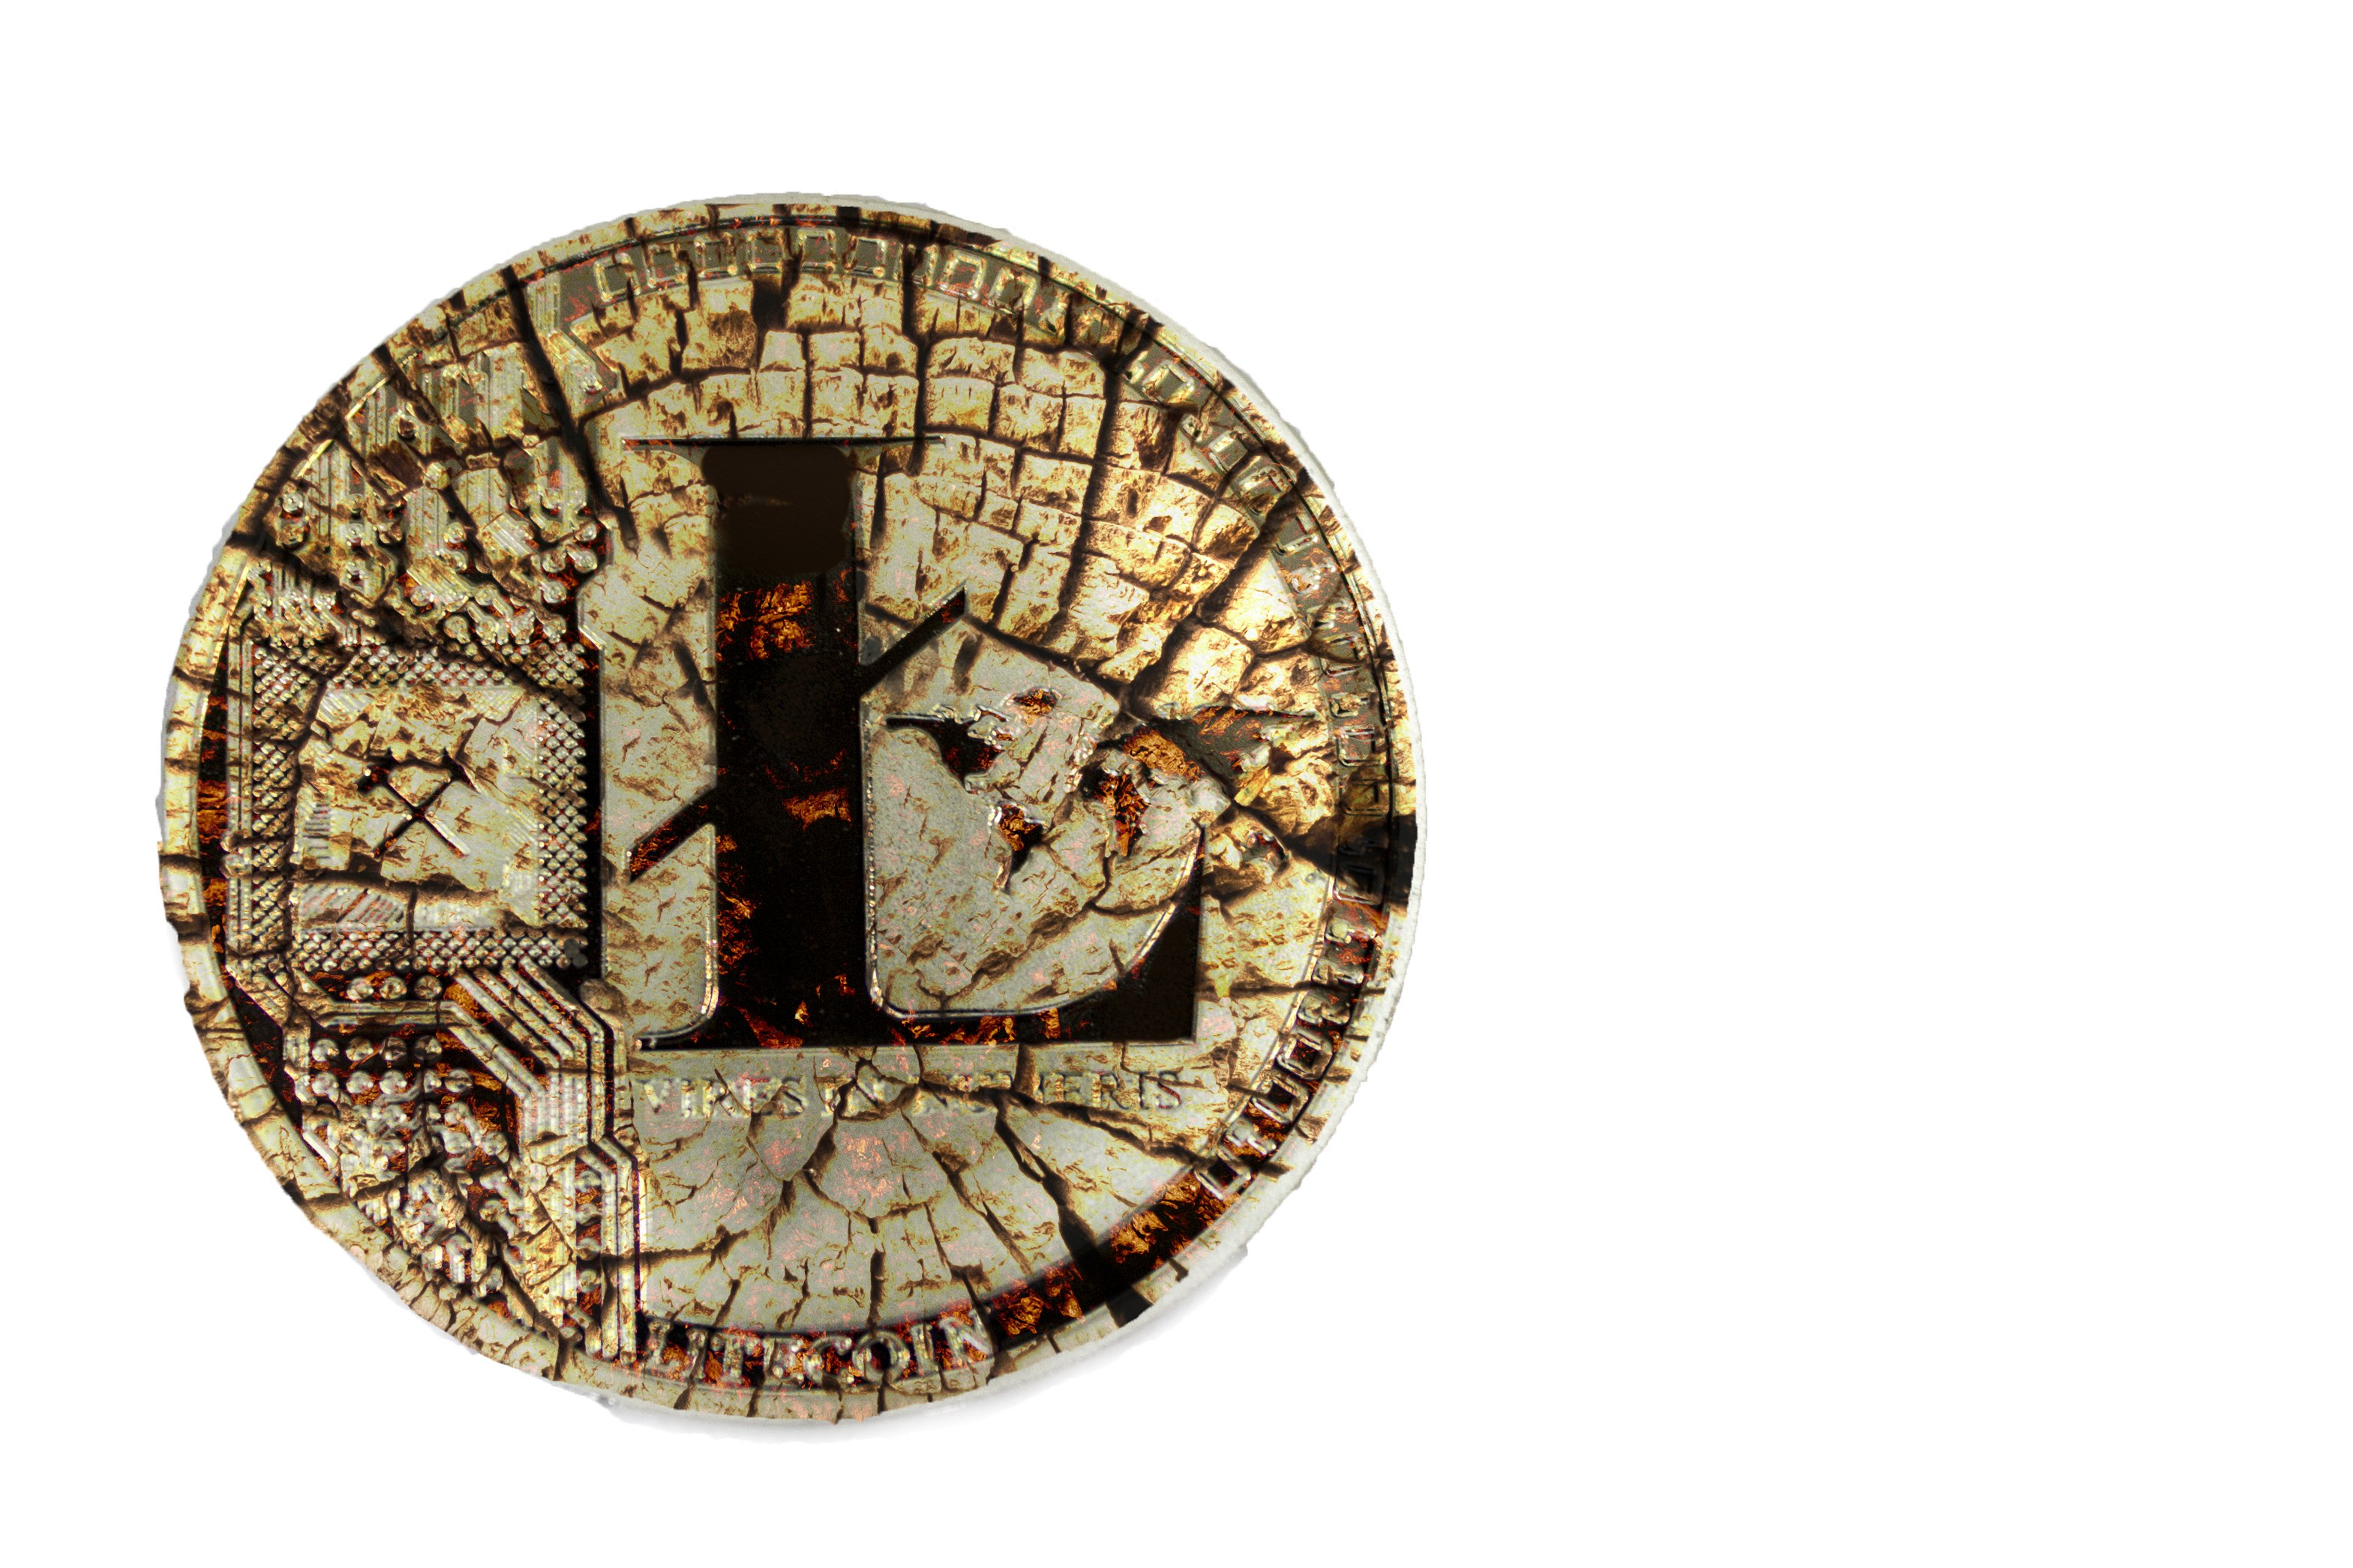 litecoin tarnished digital silver